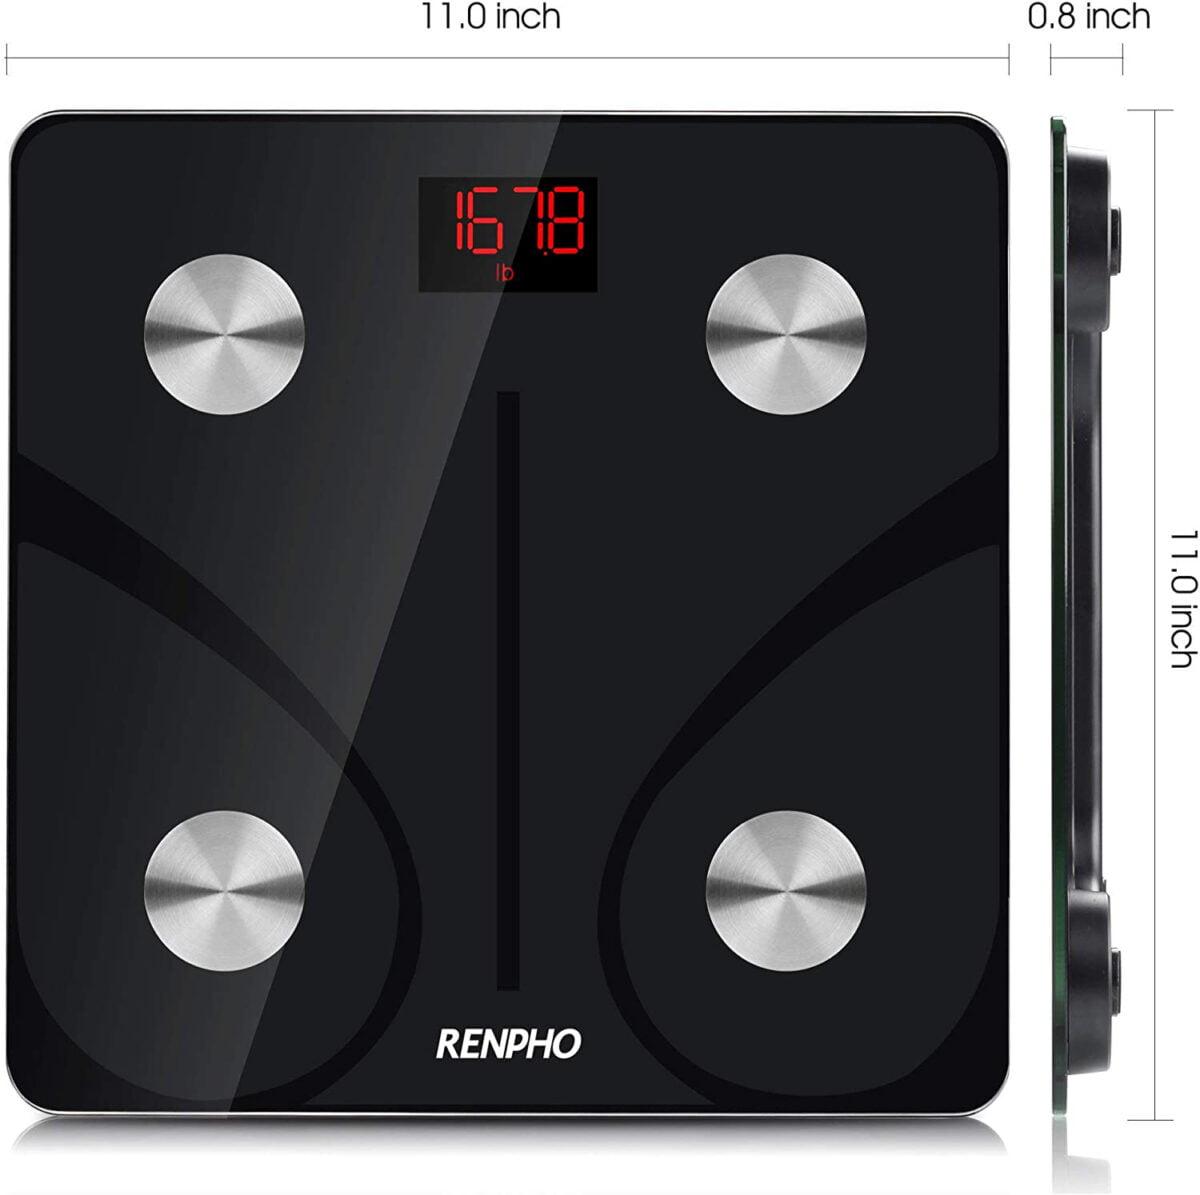 RENPHO Body Fat Scale dimensions